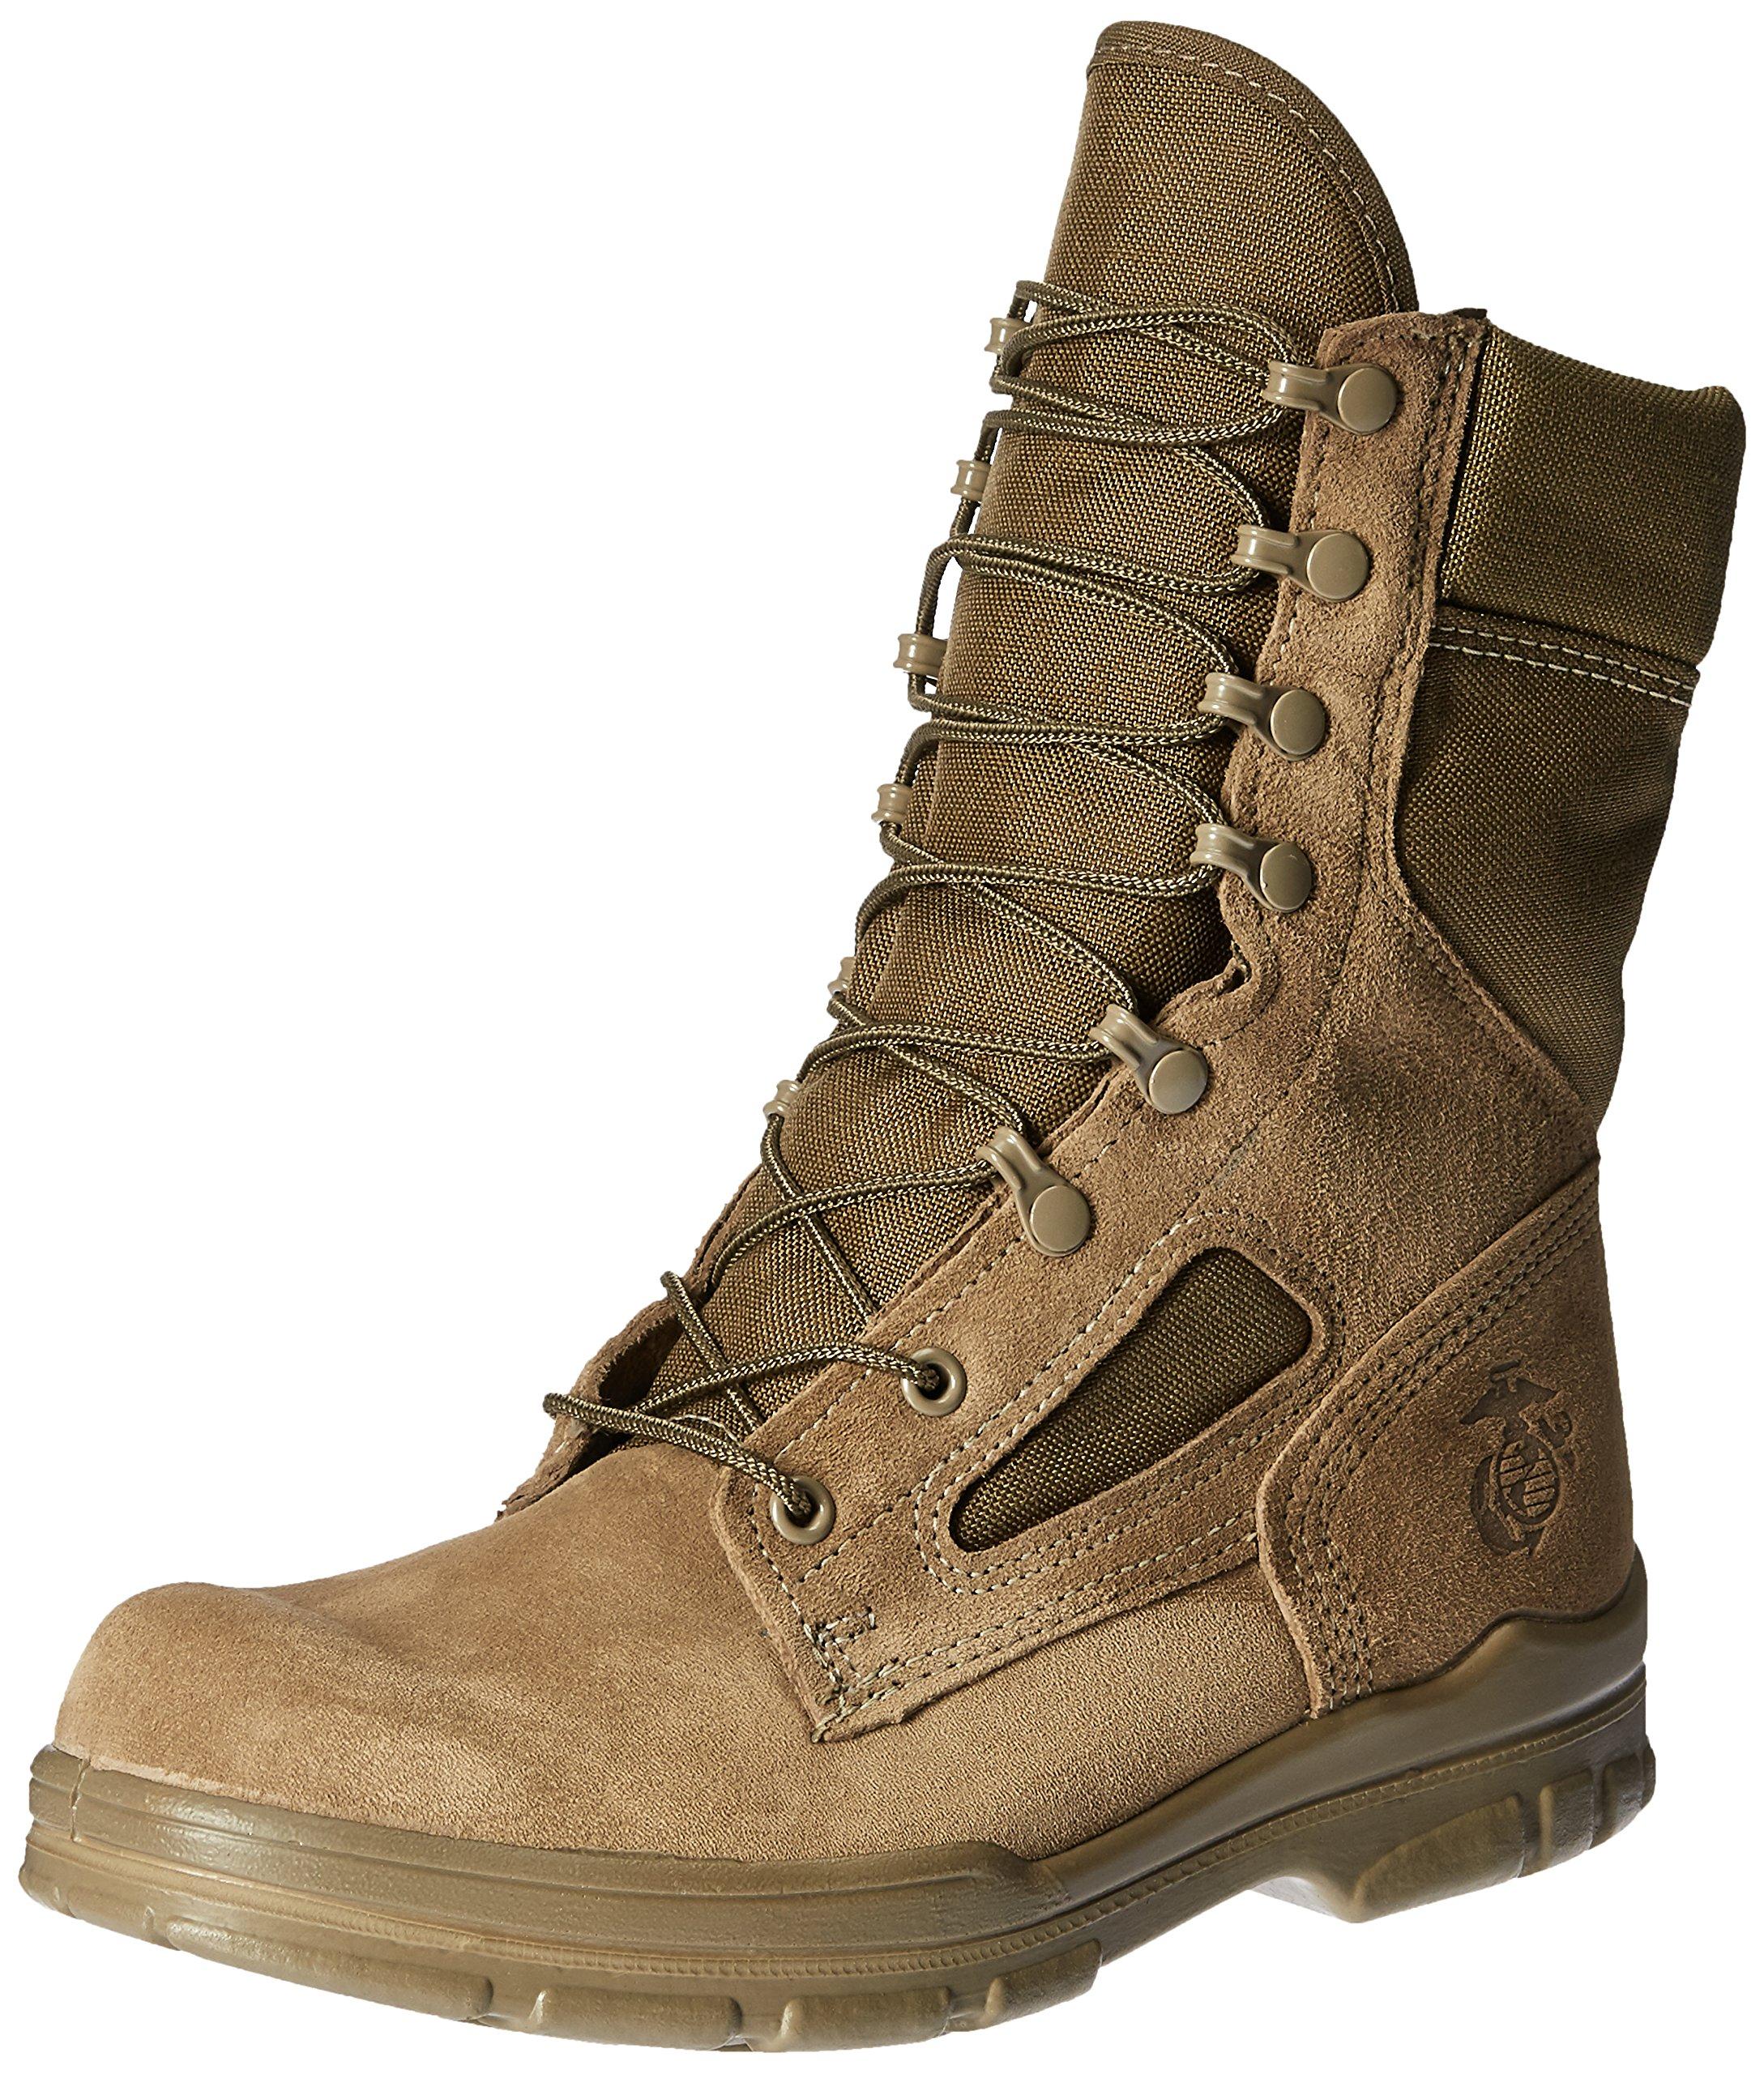 Bates Men's USMC Lightweight DuraShocks Military & Tactical Boot, Olive Mojave, 9.5 M US by Bates